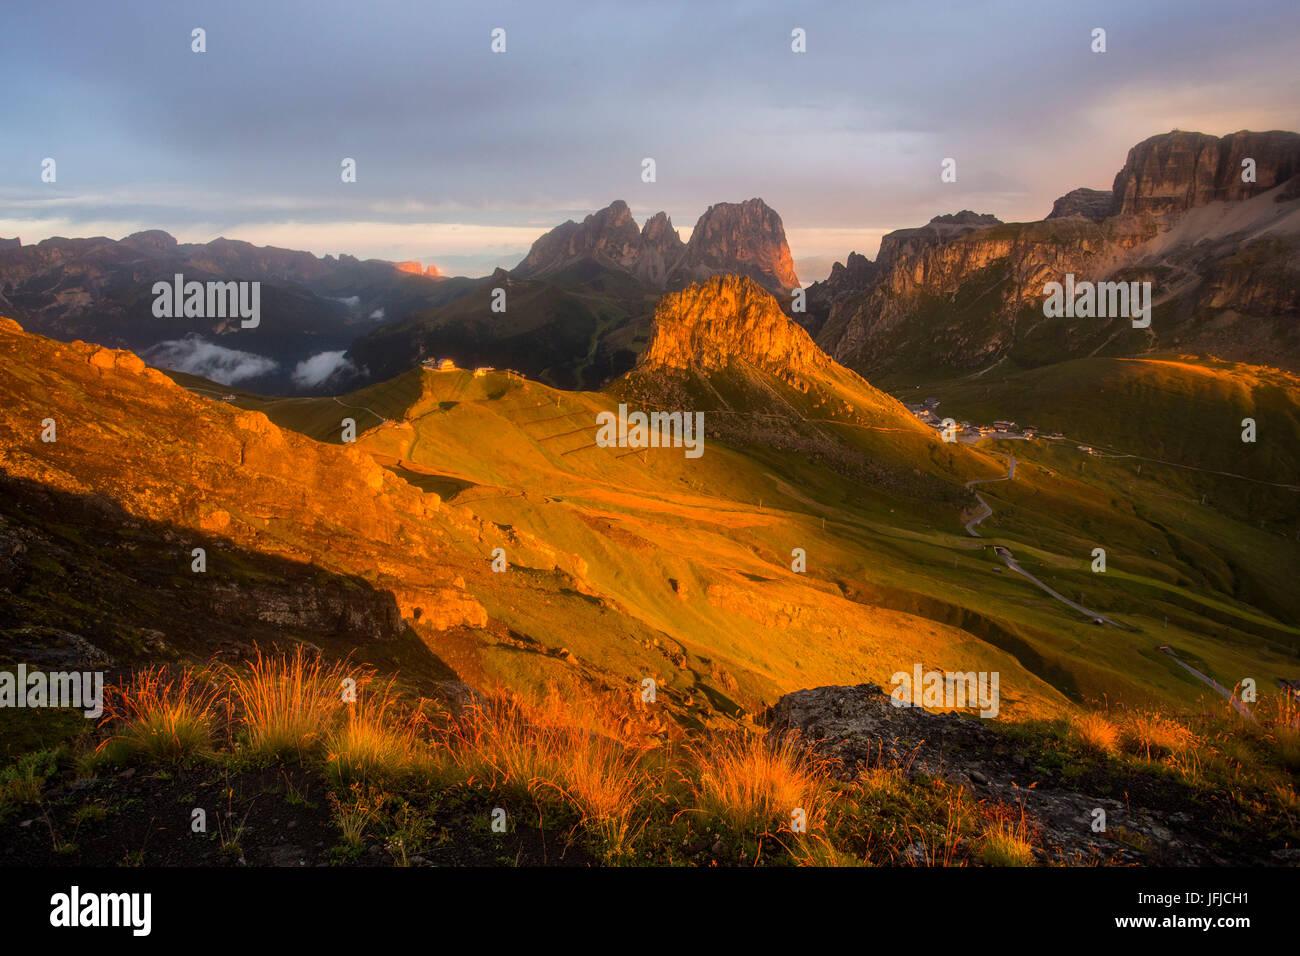 The sunrise light over Pordoi pass - Trento, Dolomites, Trentino - Stock Image